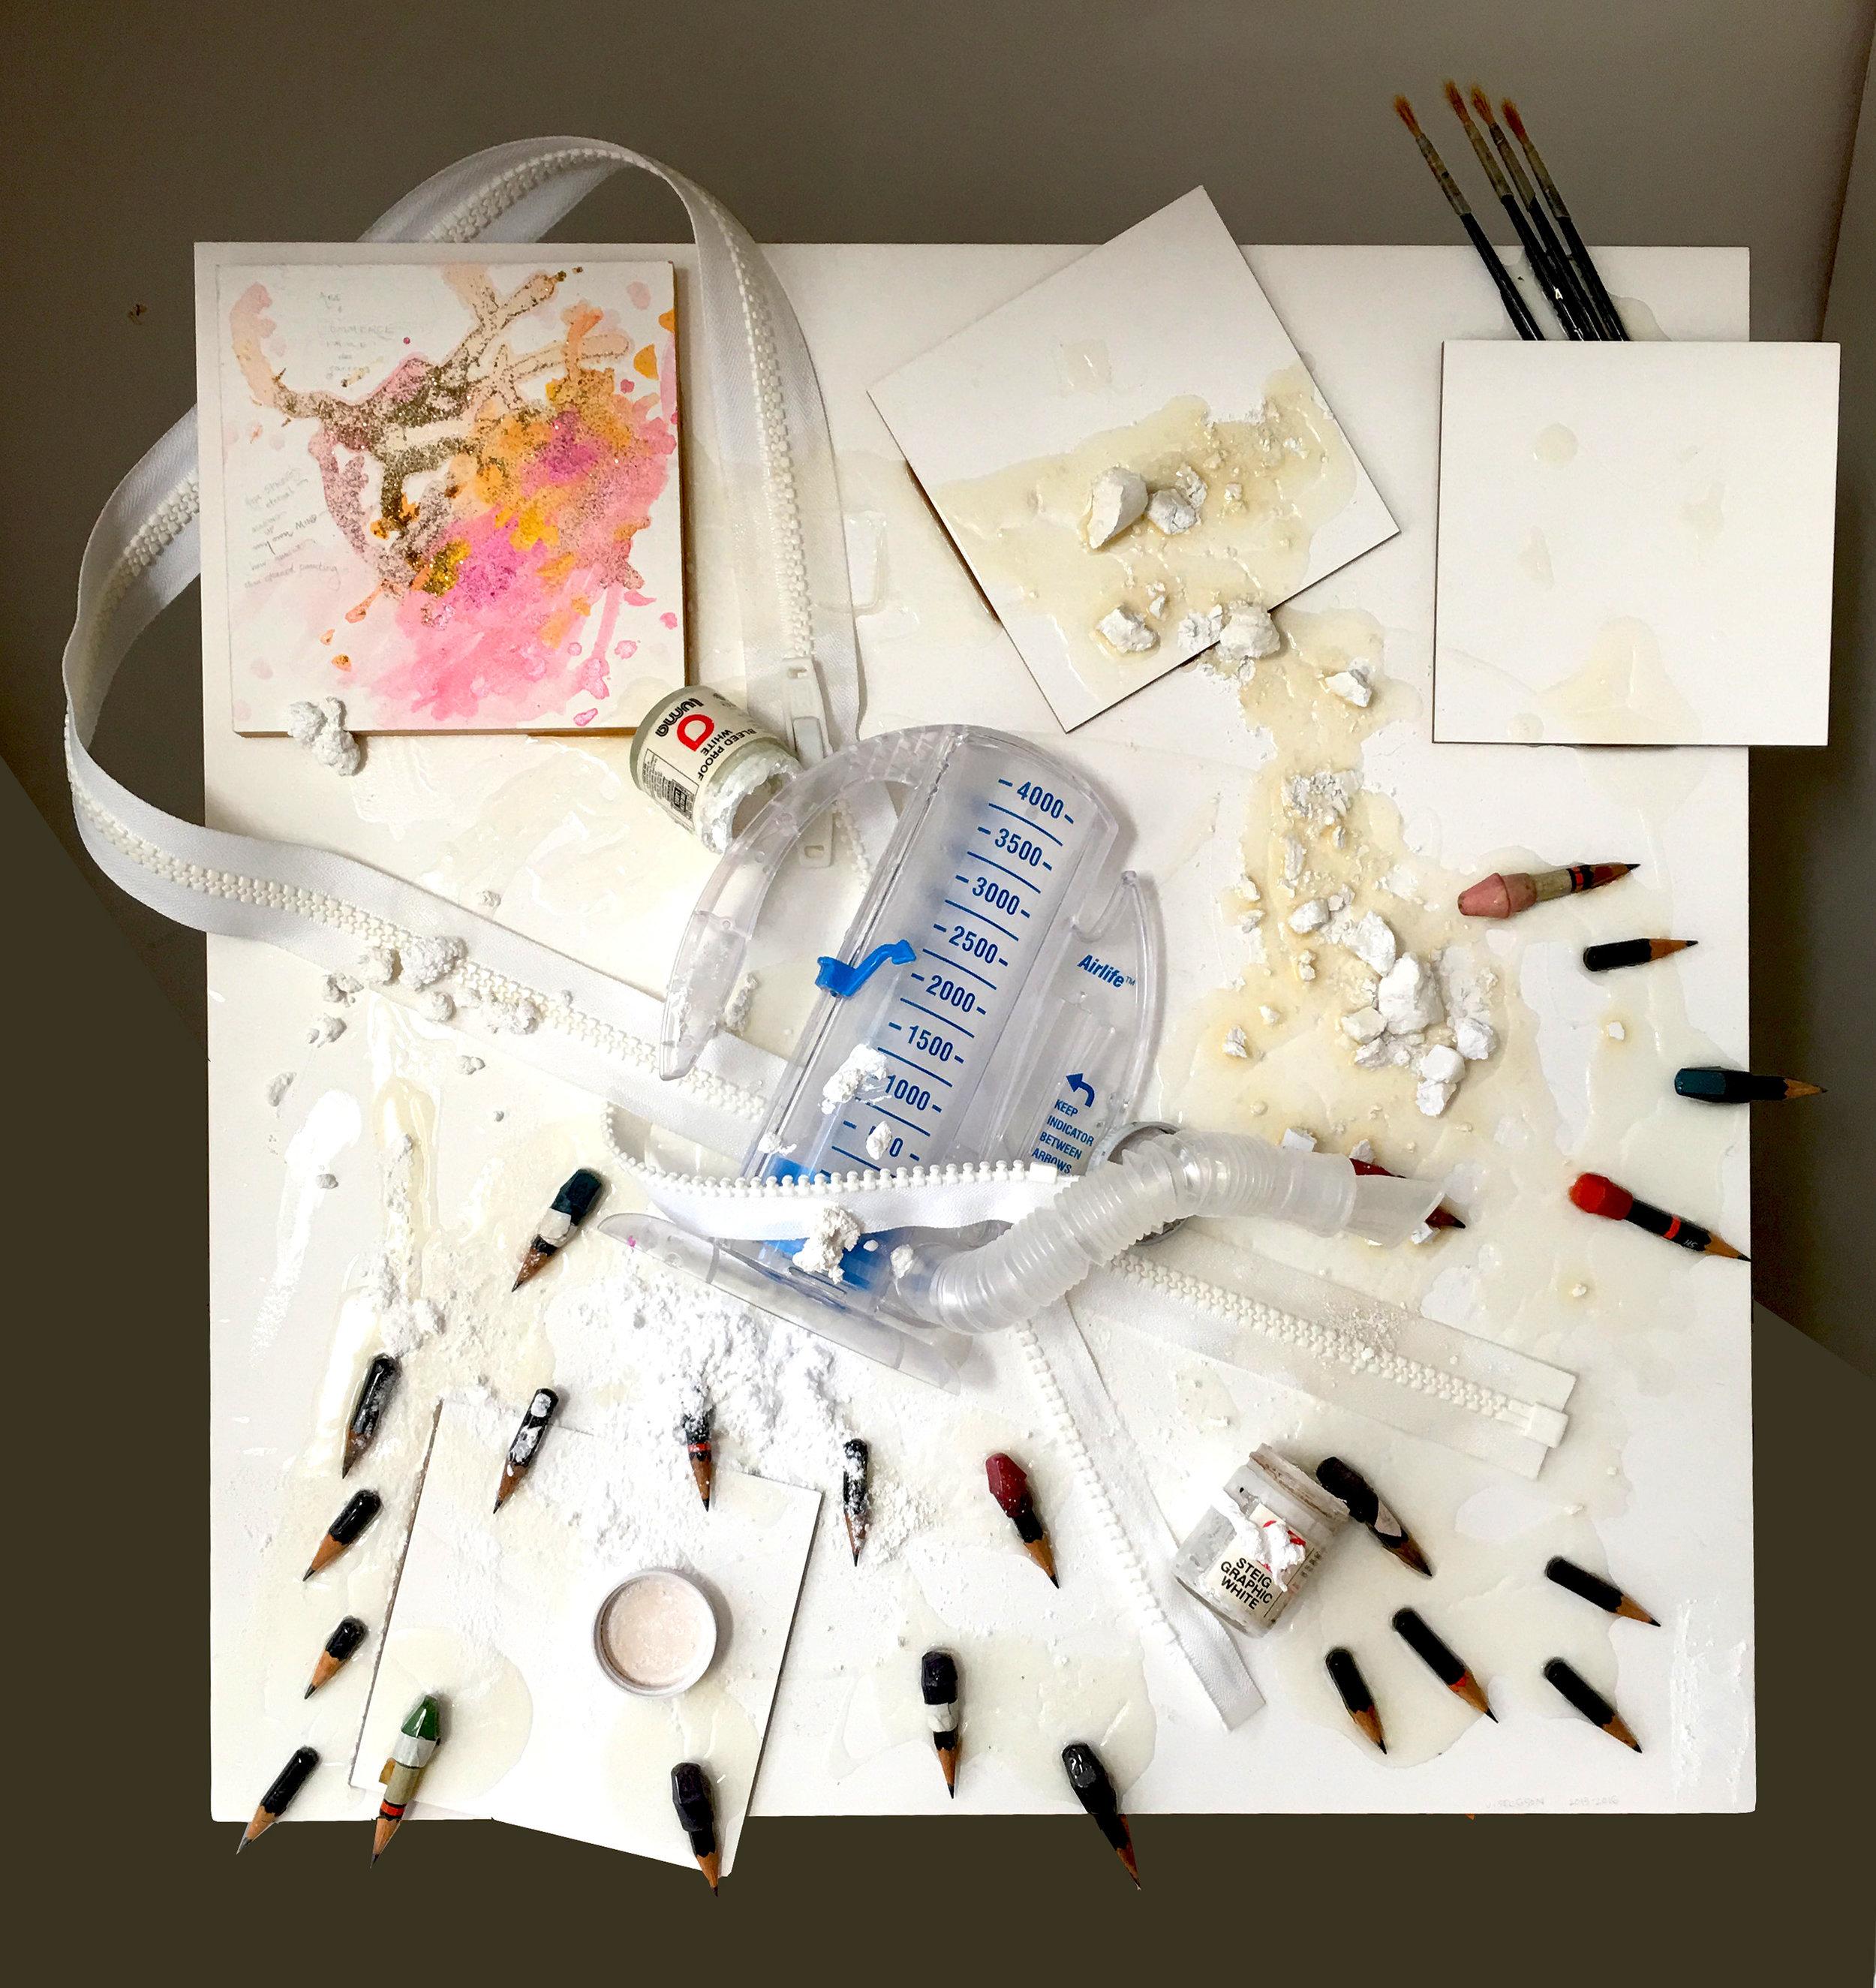 breathe , multi-media (pencil stubs, hospital breath builder, zipper, worn brushes)on gessoed acid-free masonite, 22x22 inches, 2016